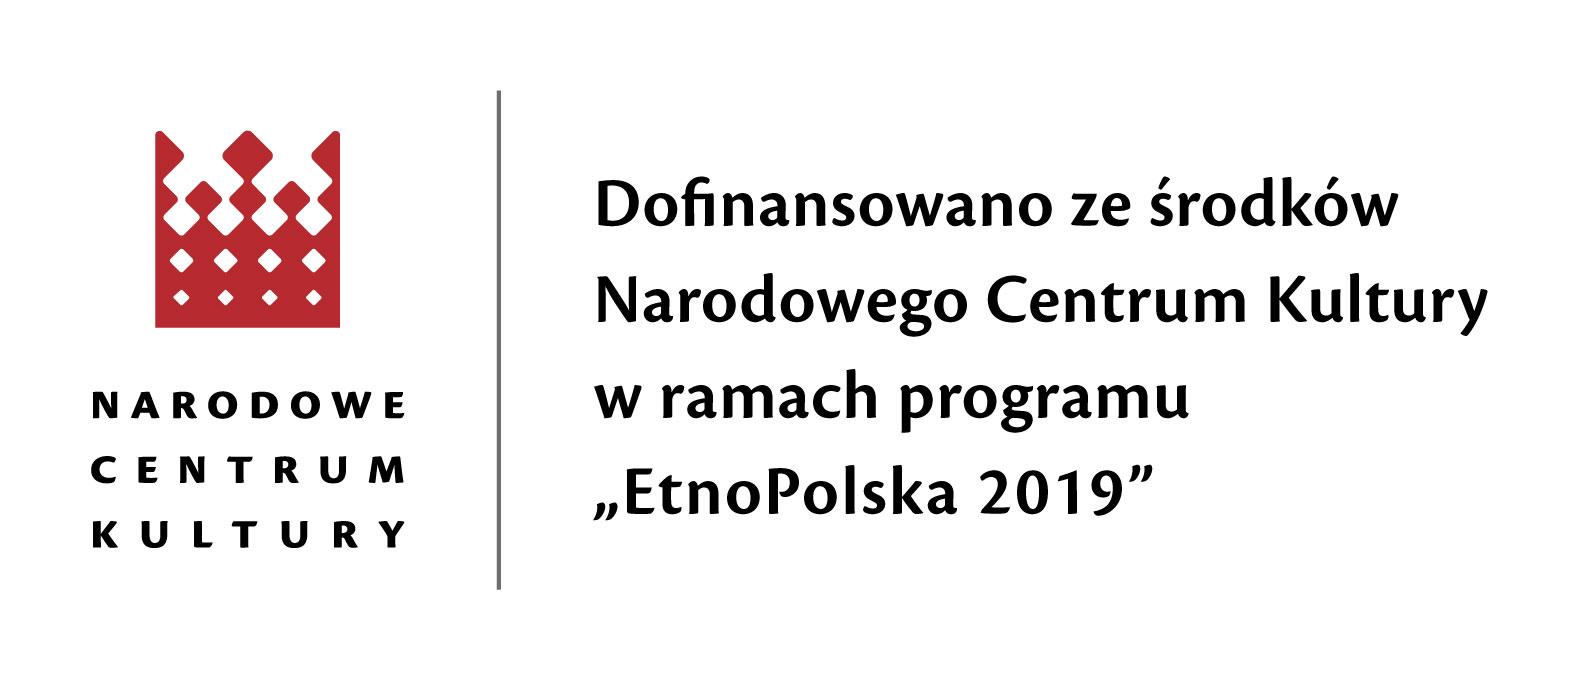 NCK_EtnoPolska_2019_rgbjpg